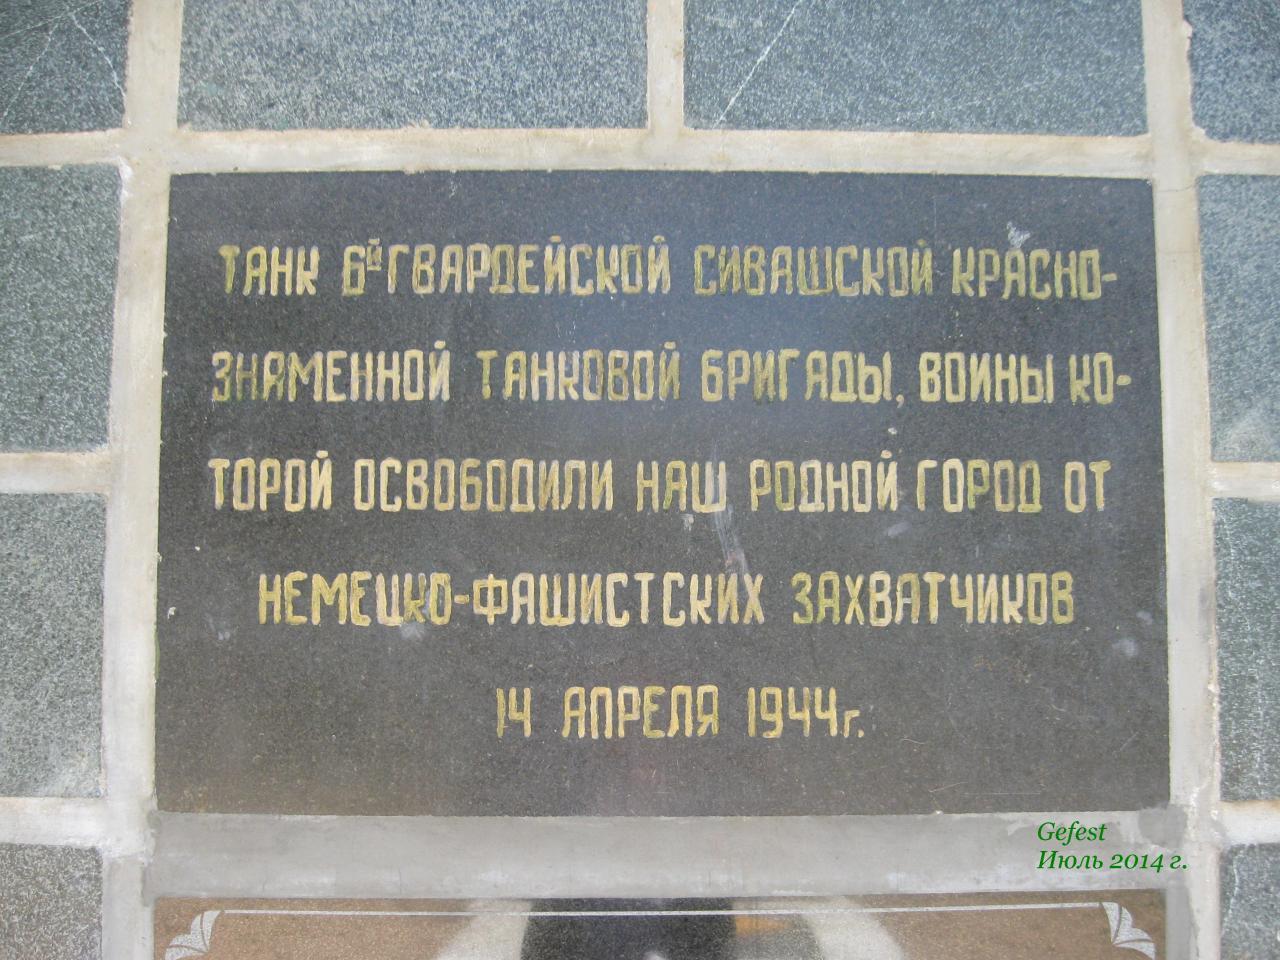 http://photos.wikimapia.org/p/00/04/34/41/72_1280.jpg